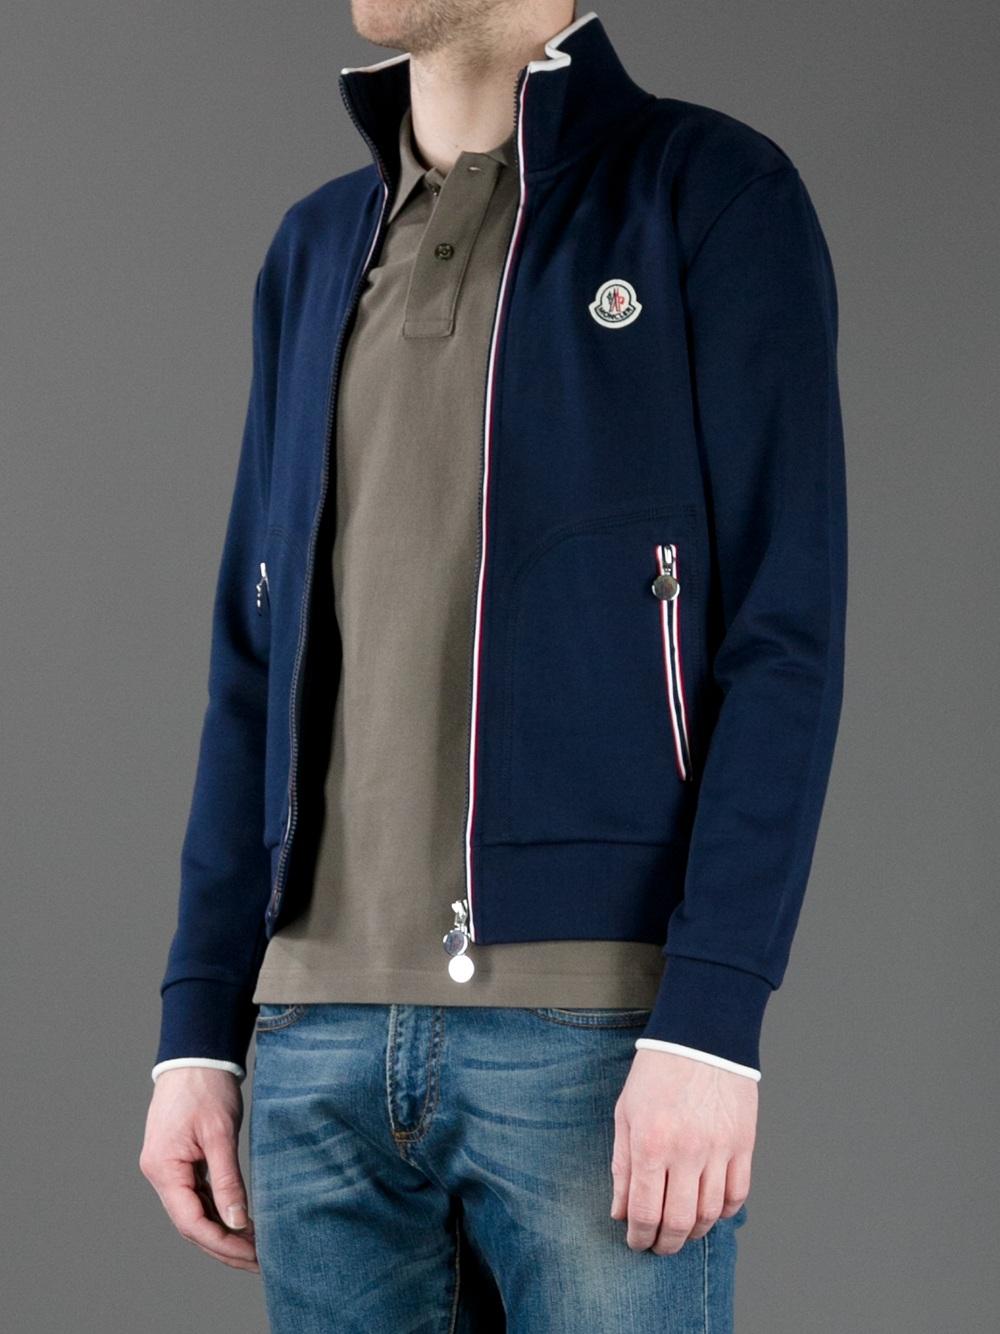 8556495f1 Moncler Zip thru Track Top in Blue for Men - Lyst